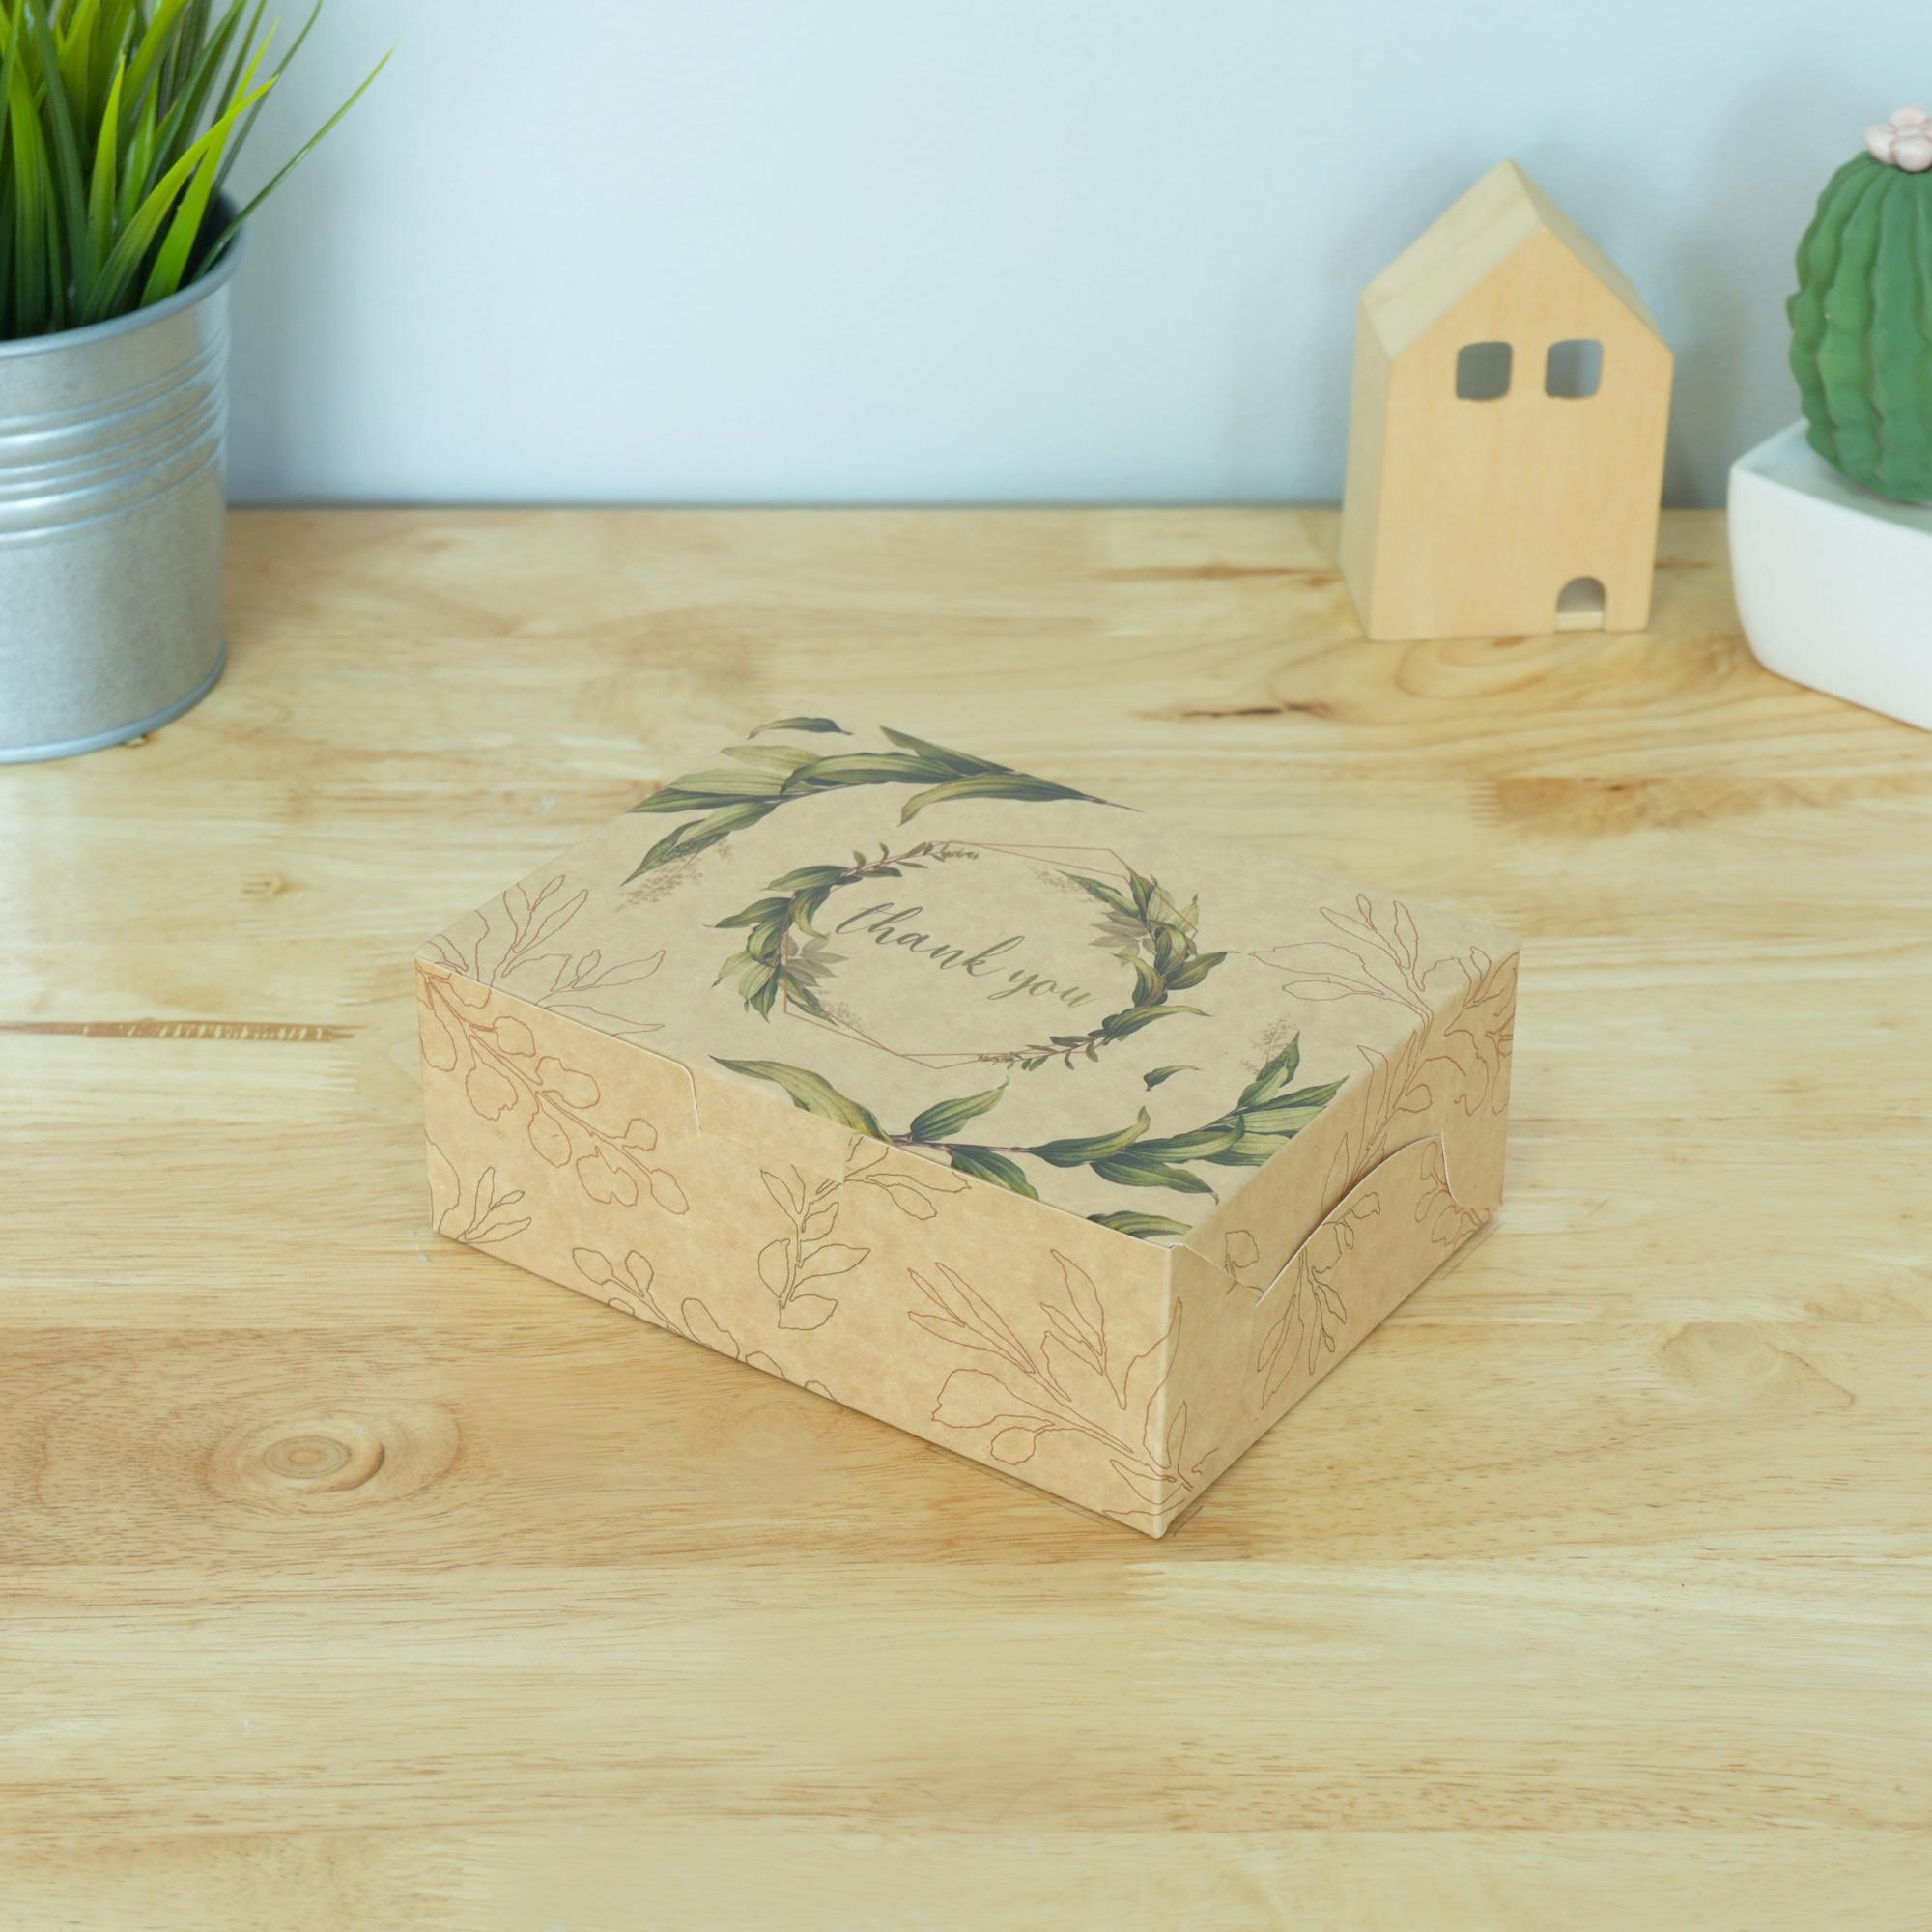 ECO Snack Box ทรงผืนผ้า ลายไบไม้ แบบ 1